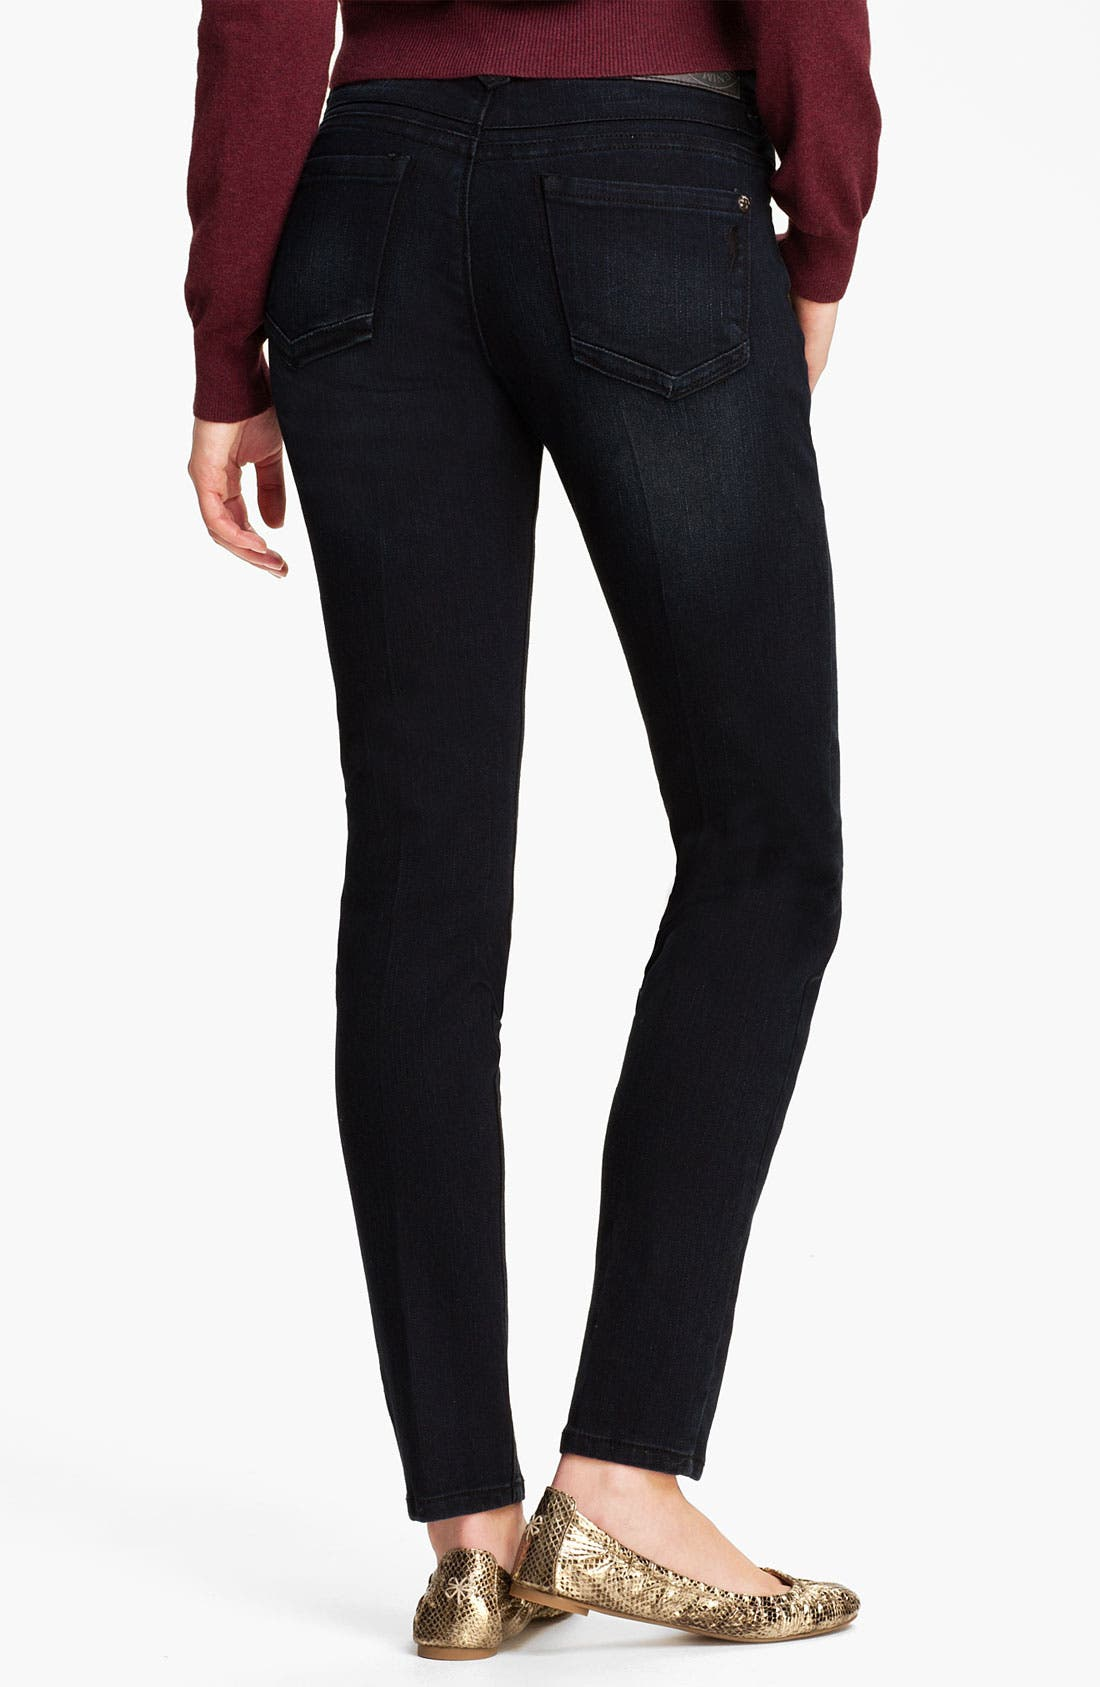 Alternate Image 1 Selected - Jolt Skinny Stretch Jeans (Juniors)